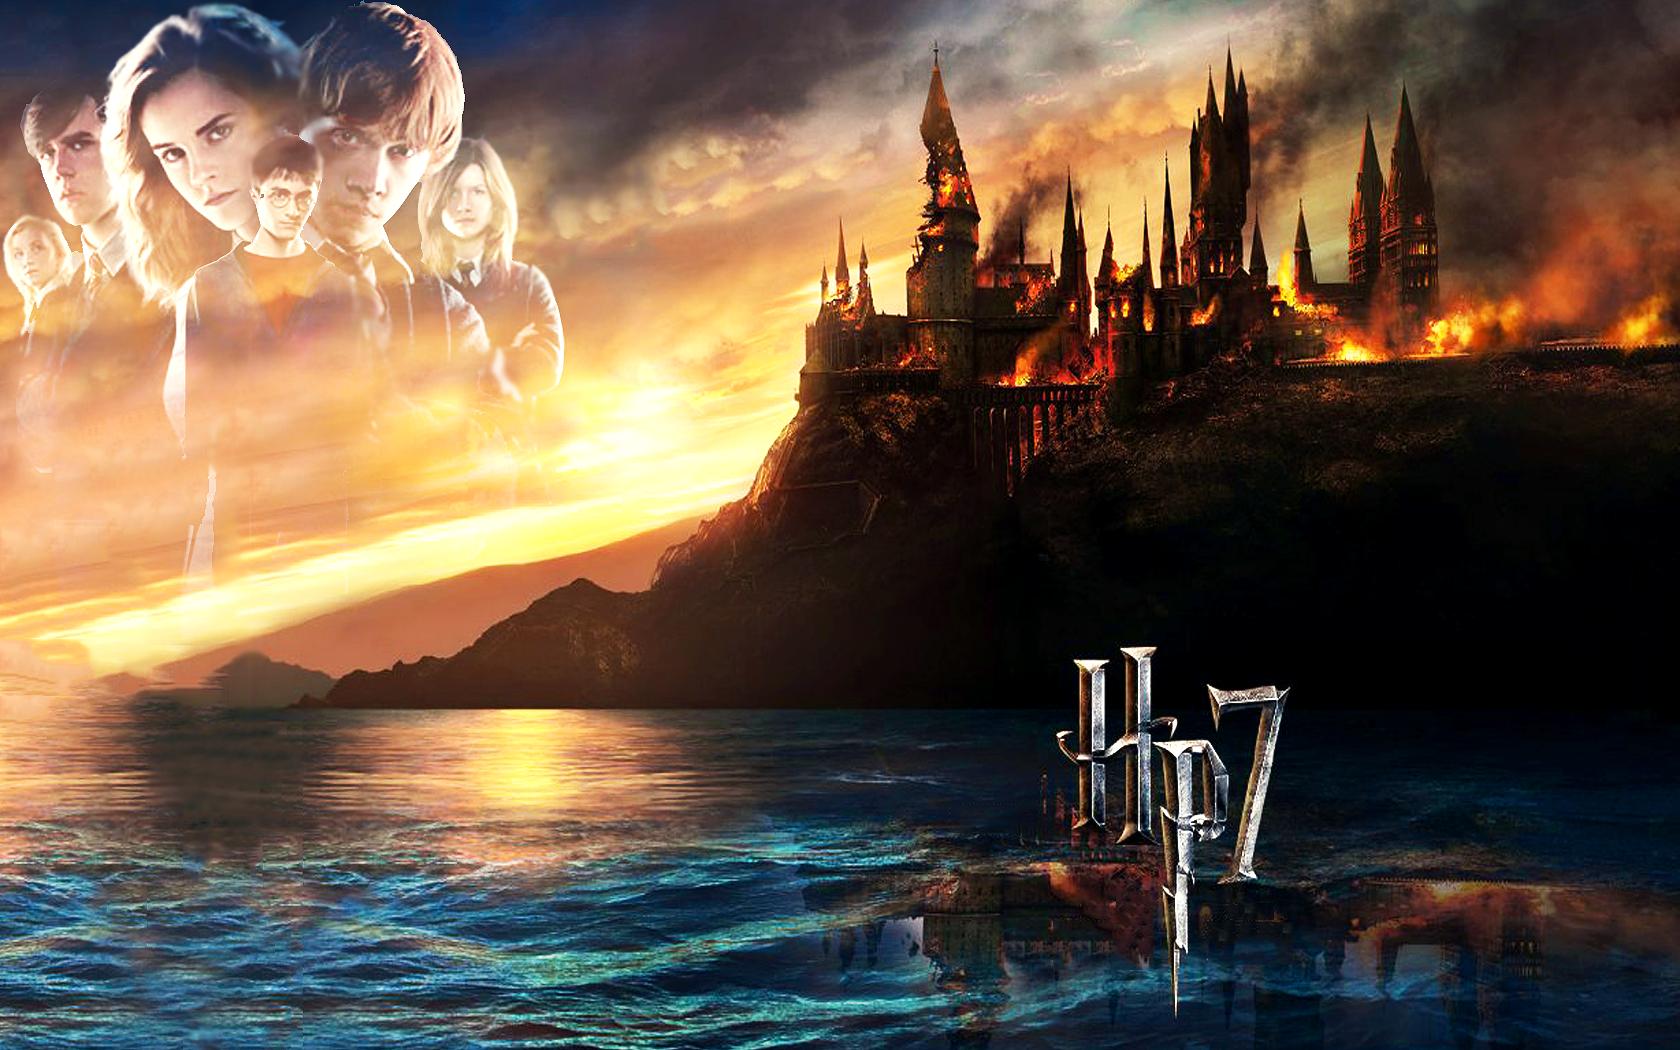 Best Wallpaper Harry Potter Windows 7 - harry_potter_7___wallpaper_by_bellselle  Pictures_77436.png